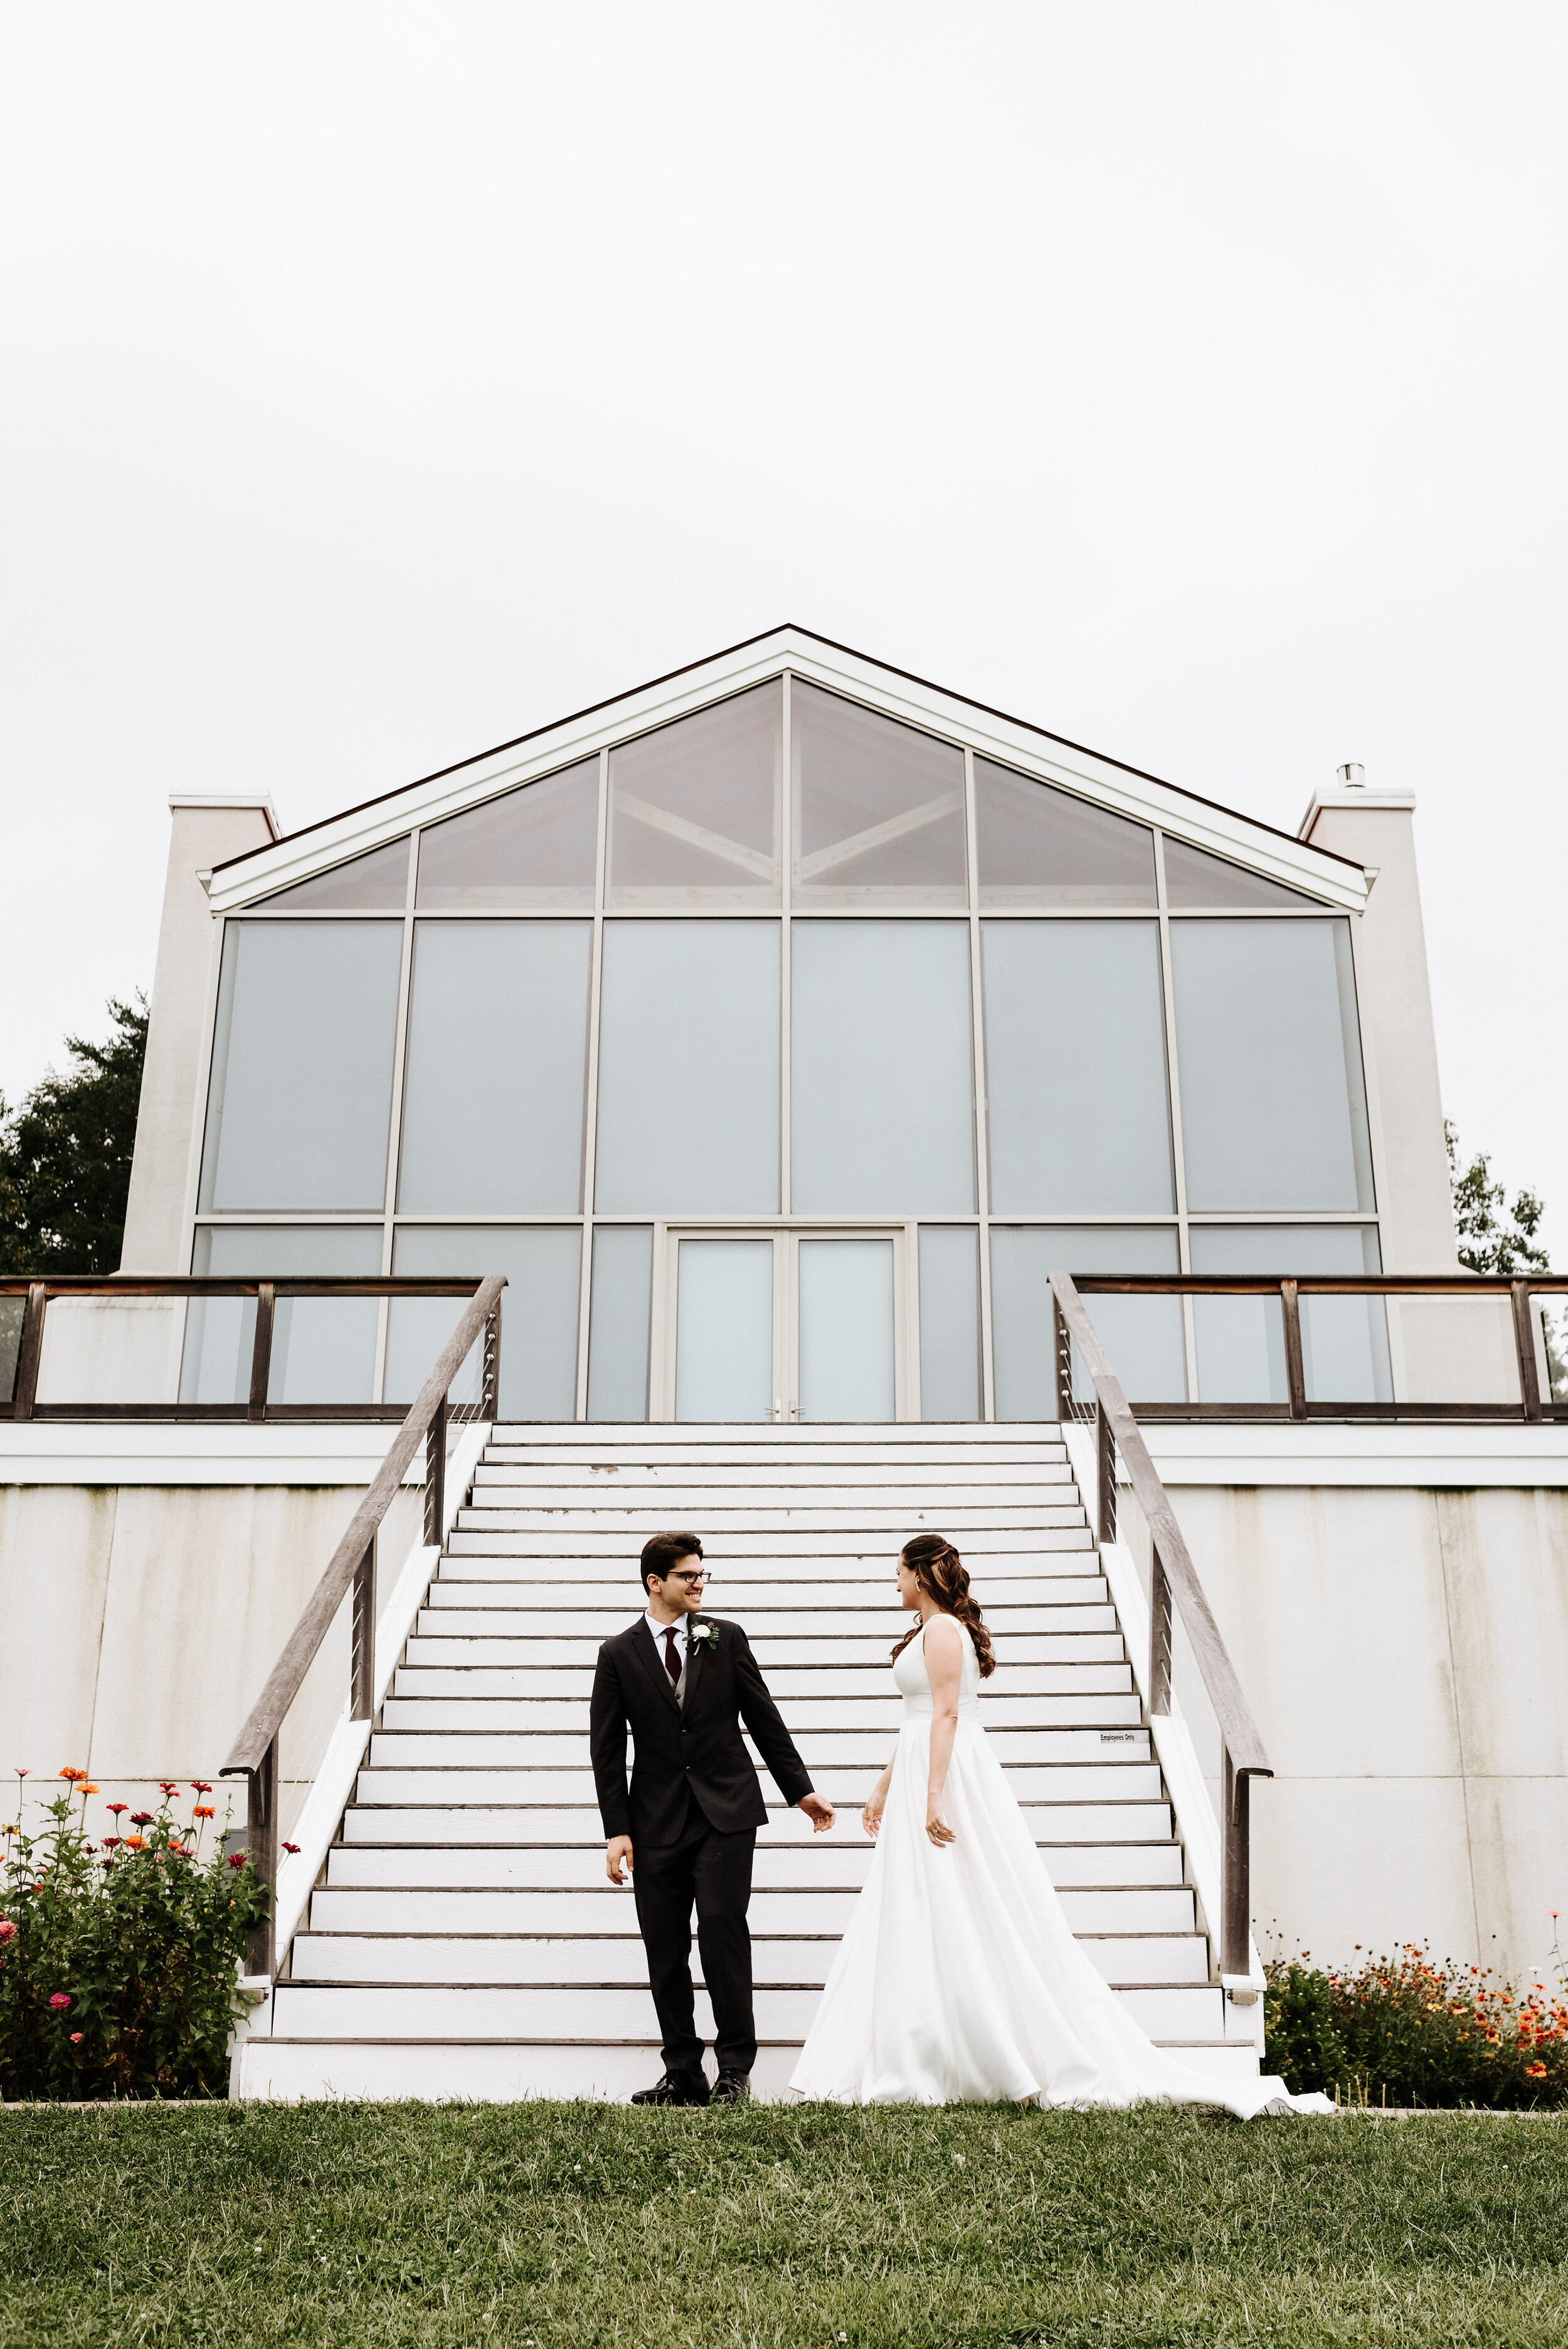 Allison_Nolan_Moss_Vineyards_Wedding_Charlottesville_Virginia_Photography_by_V_27.jpg